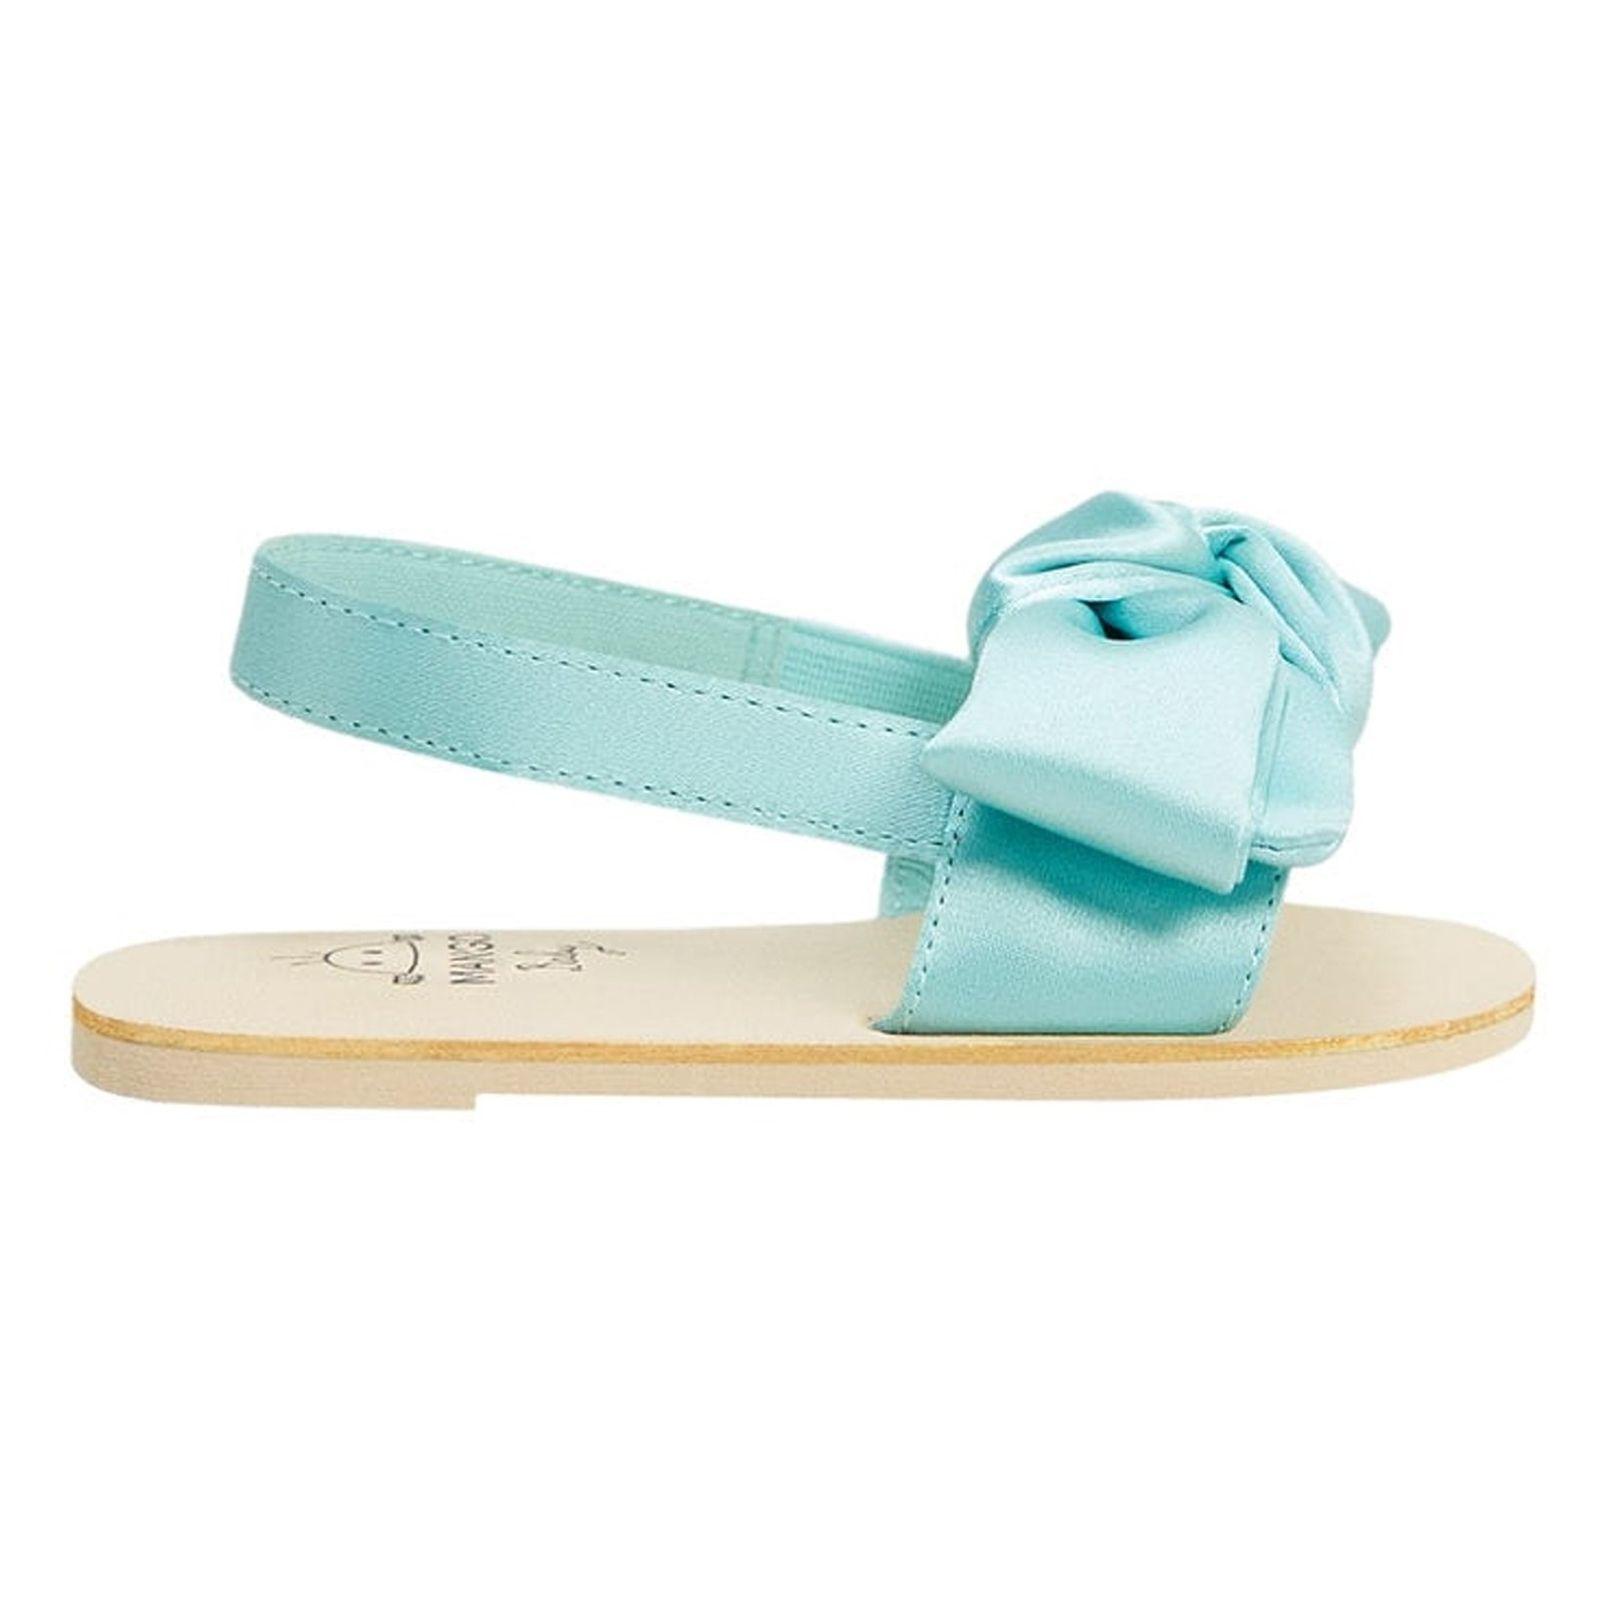 کفش بندی نوزادی دخترانه - مانگو - آبي روشن  - 1